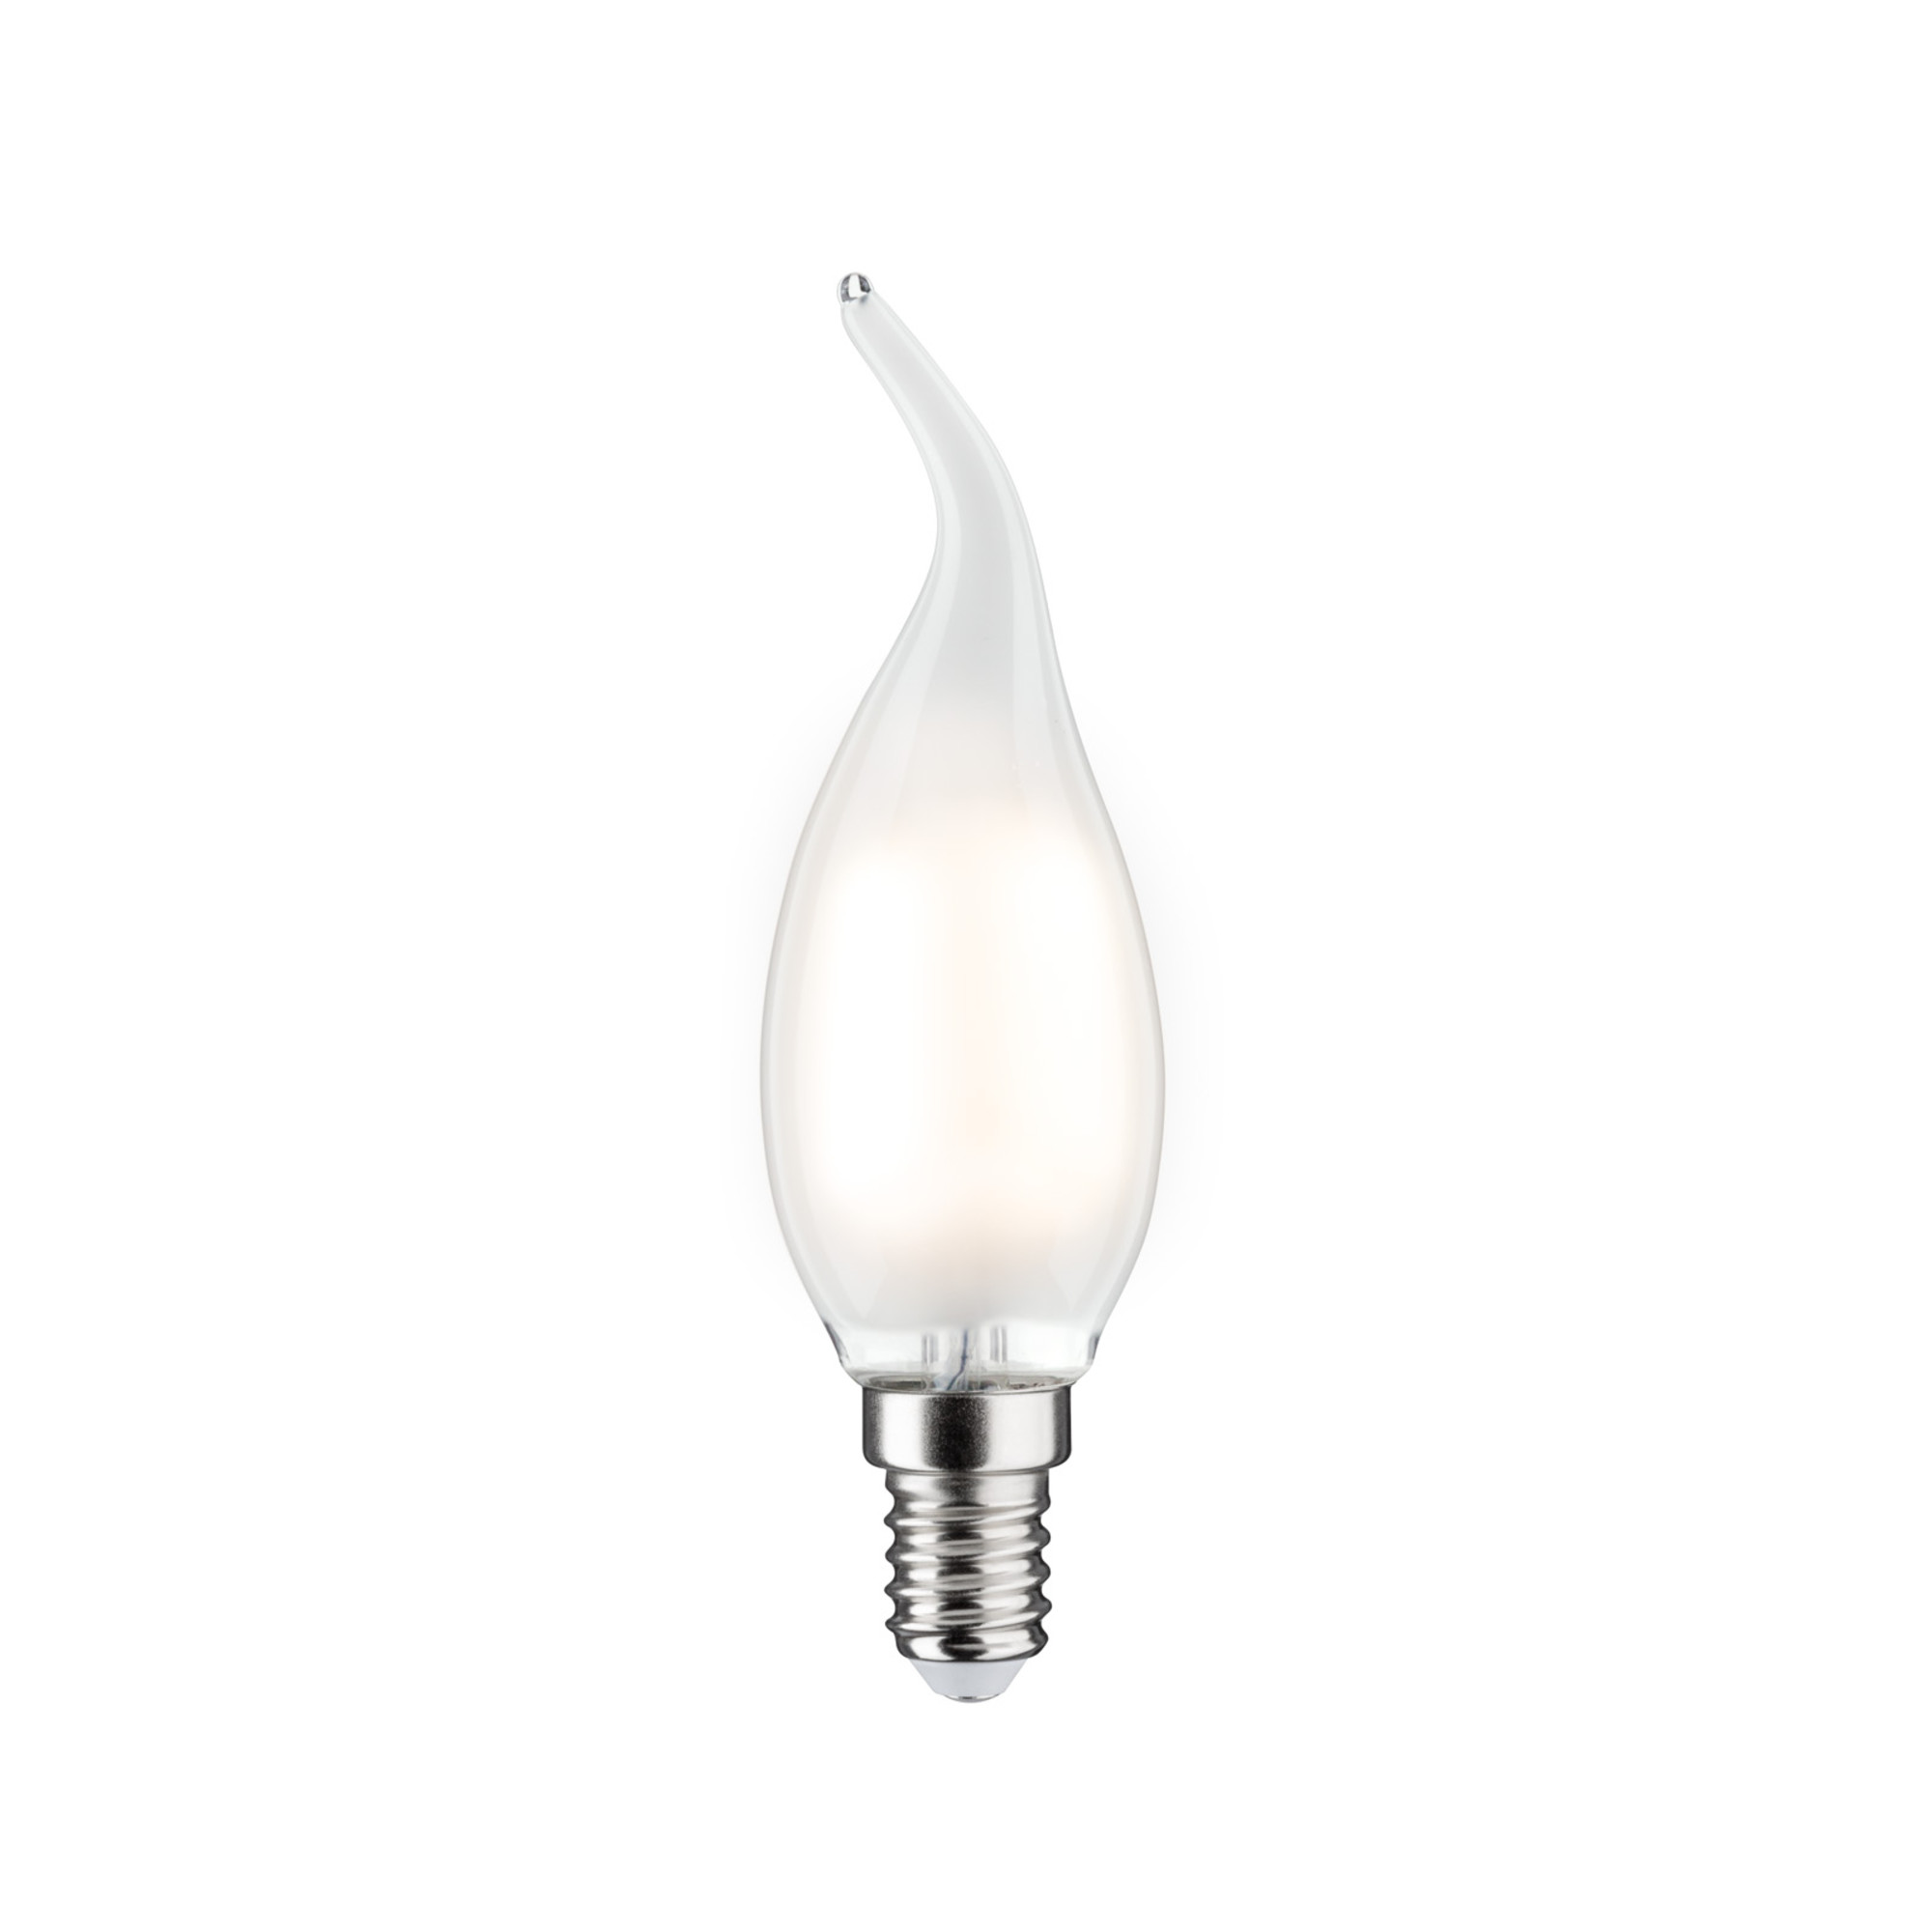 Светодиодная лампочка Paulmann 28362 E14 250 Лм 2.5 Вт